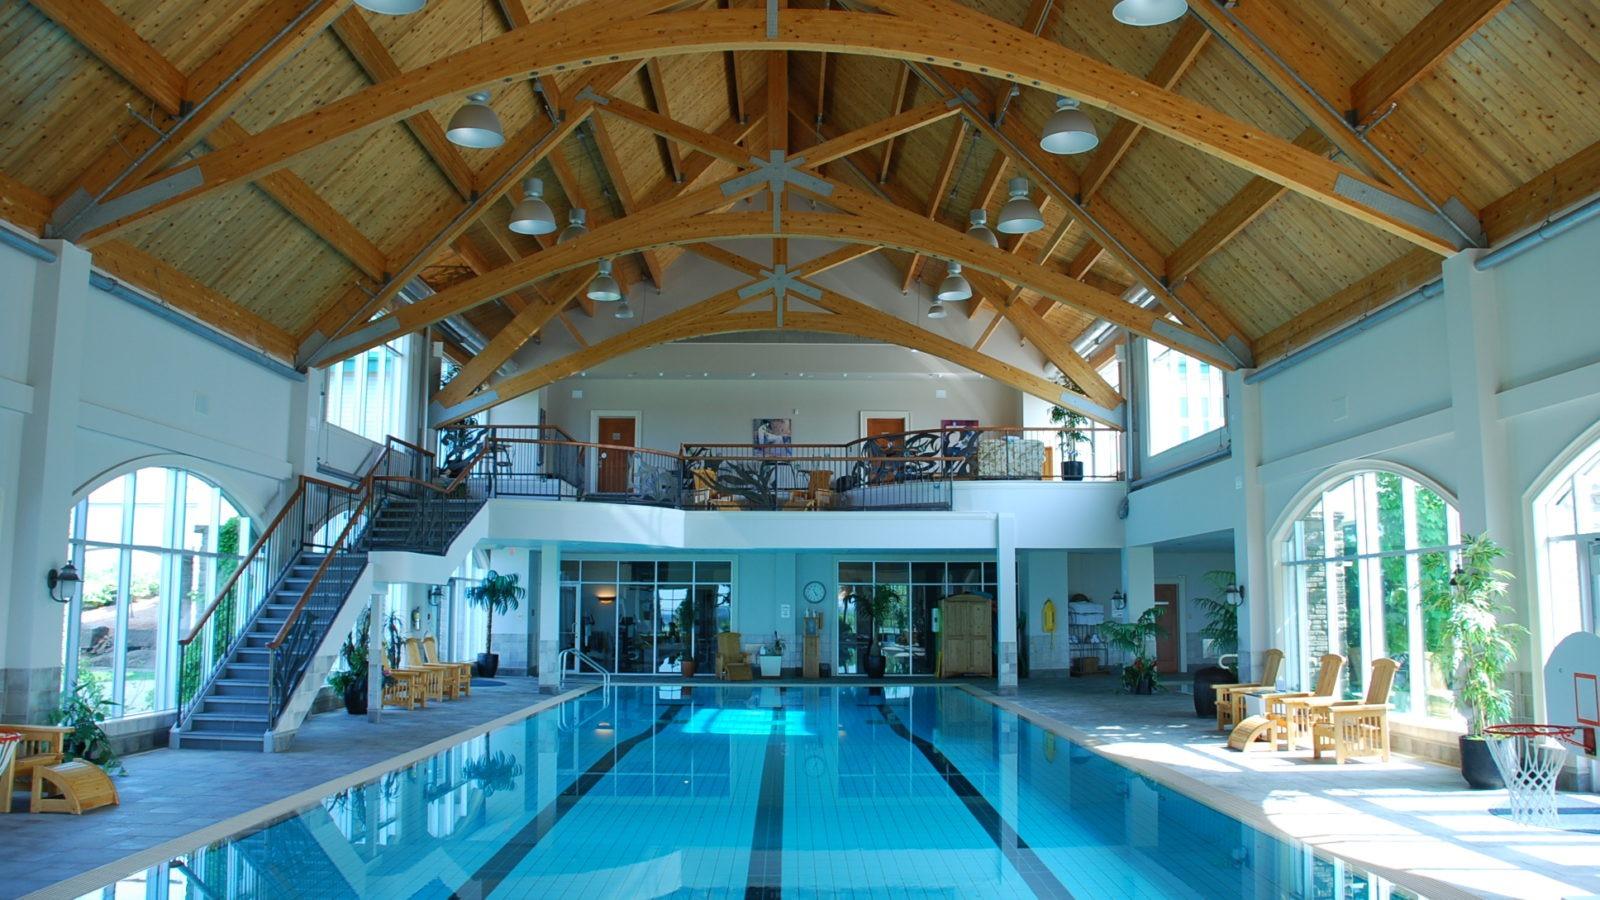 fox-harbr-resort-pool-spa-end_38342588204_o